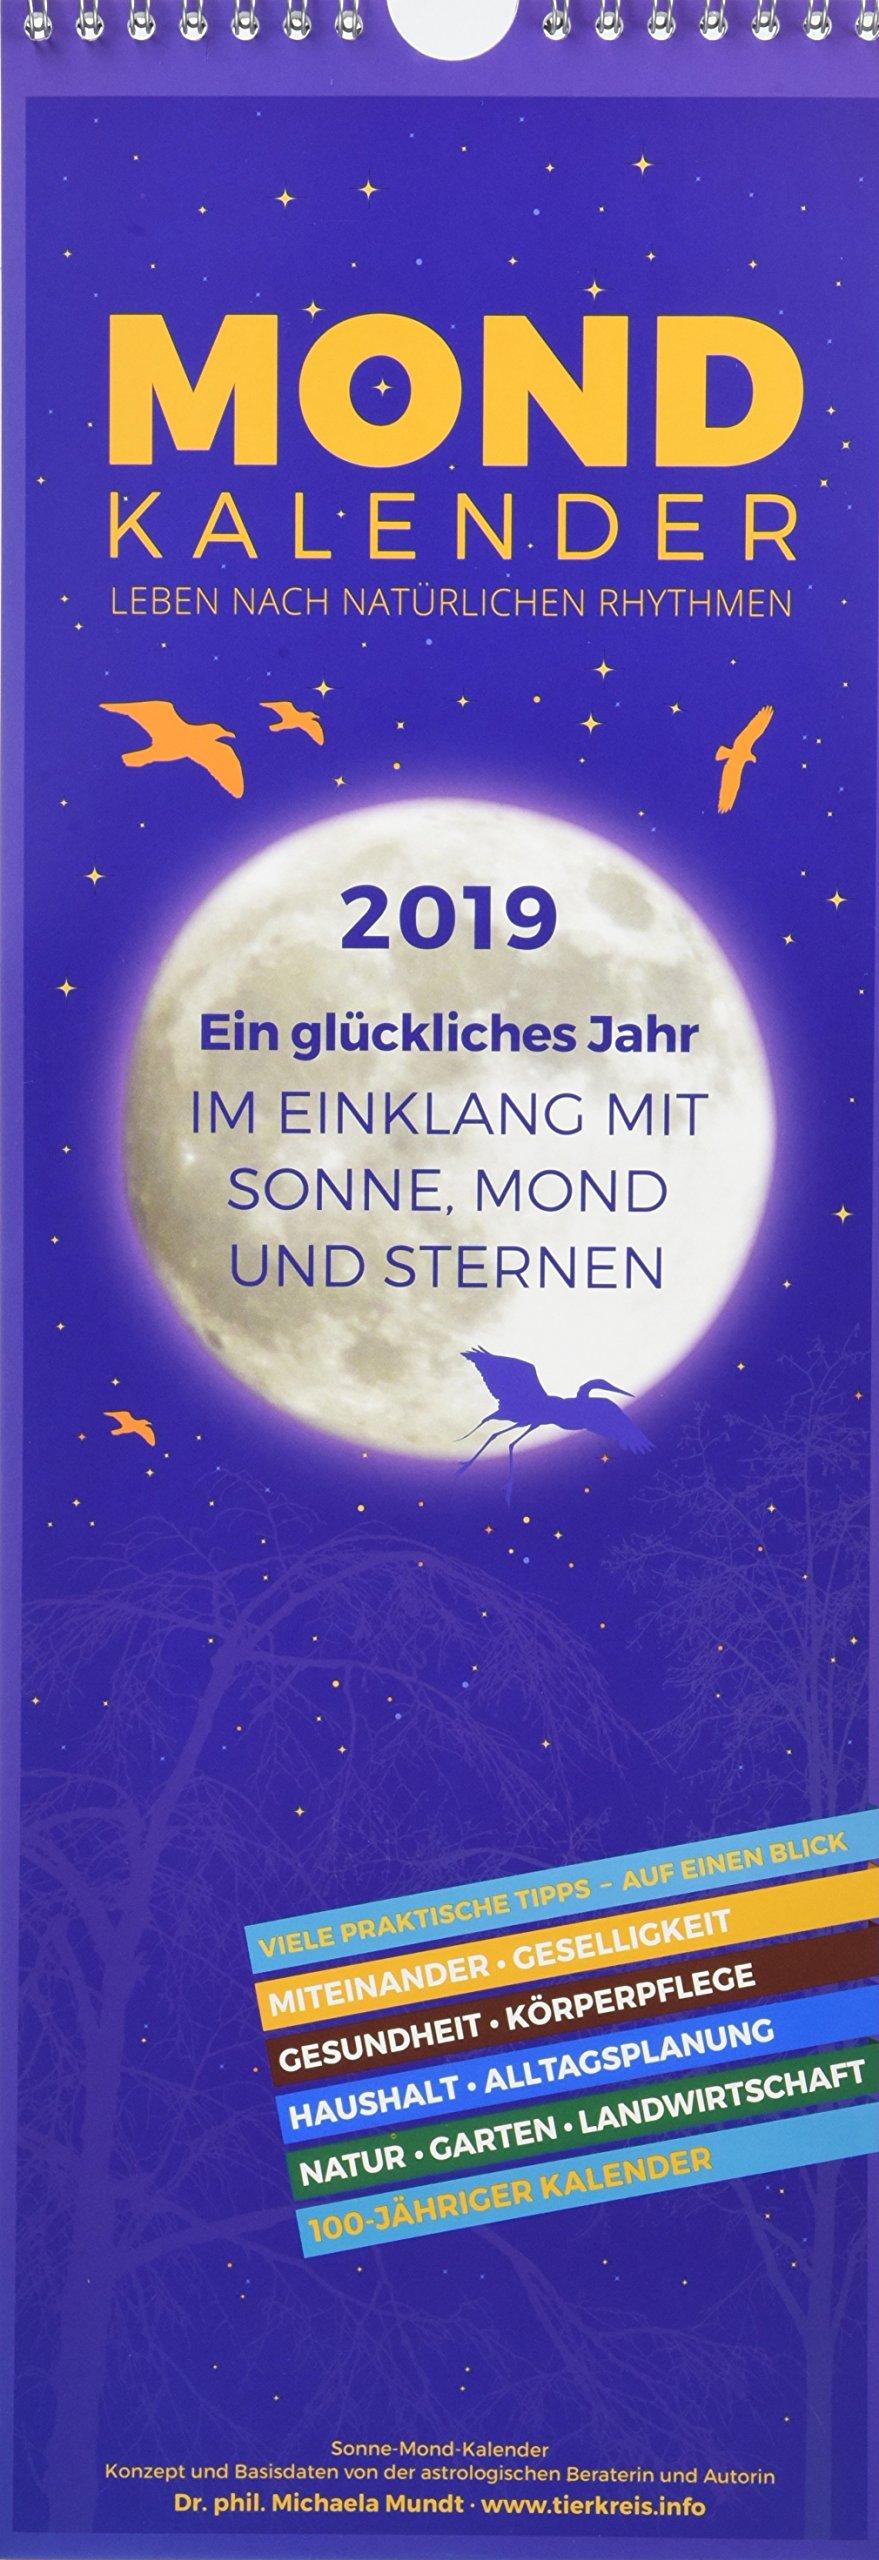 Mondkalender 2019 - Streifenkalender (15 x 42) - Wandplaner - mit 100-jährigem Kalender Kalender – Terminkalender, Posterkalender, Wandkalender Michaela Mundt ALPHA EDITION 3840795516 Astrologie